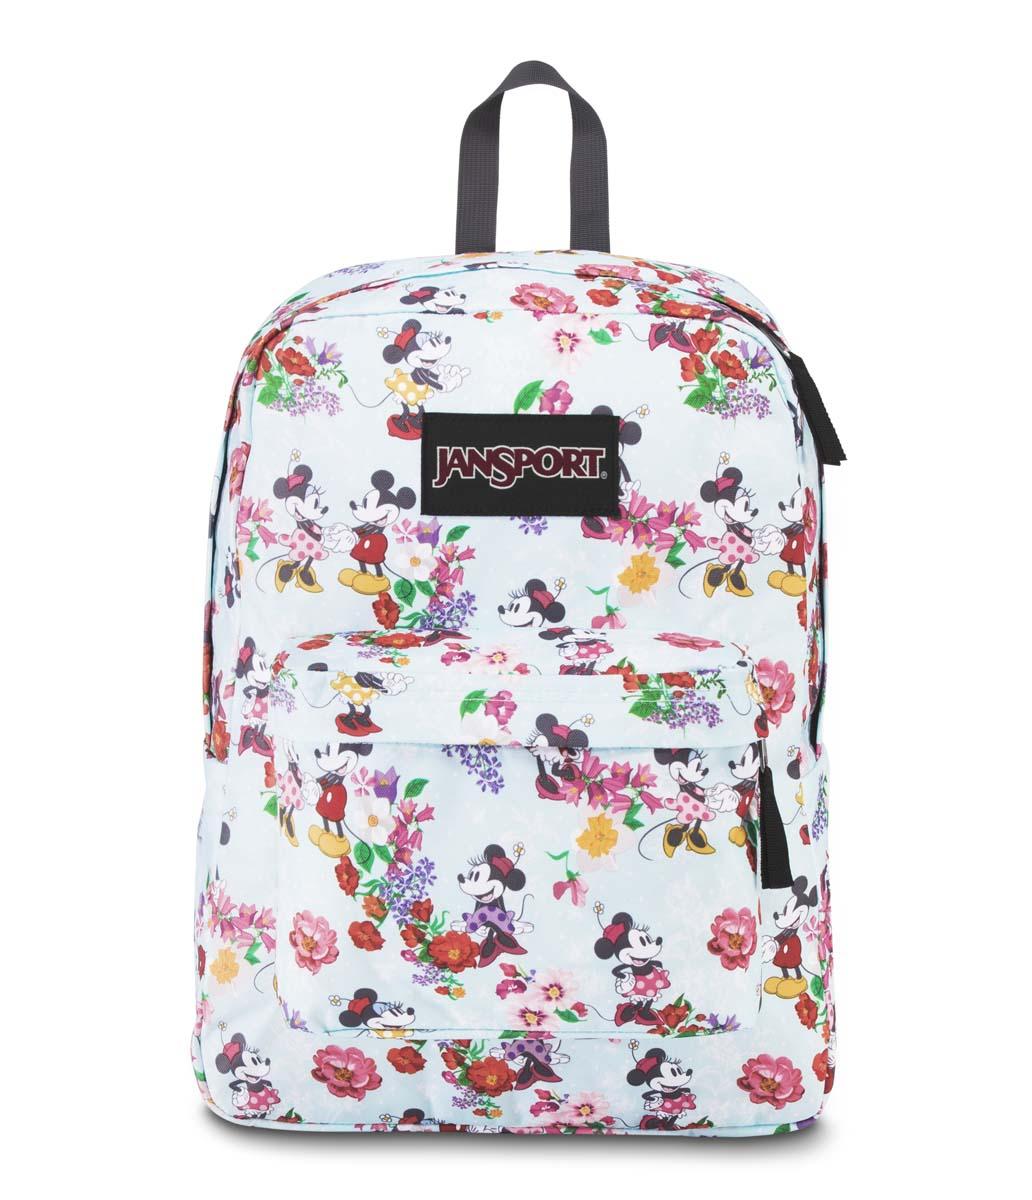 JanSport กระเป๋าเป้ รุ่น Superbreak - Disney Blooming Minnie